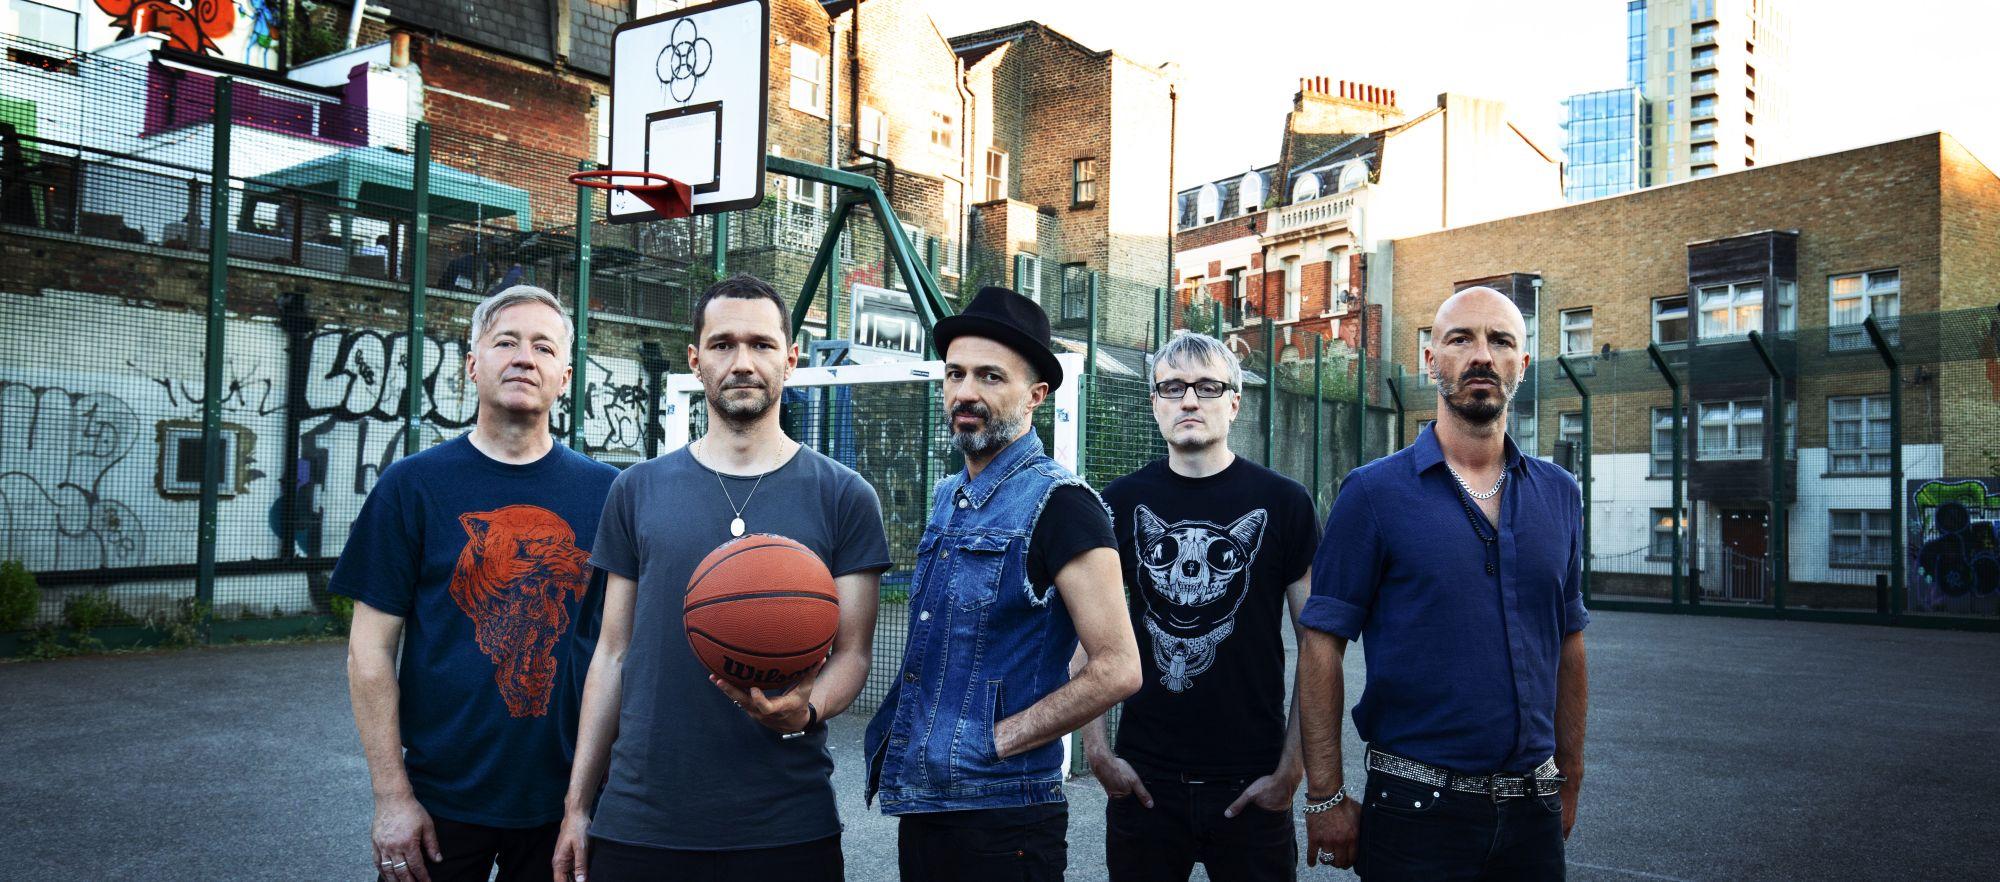 Nuovo album Subsonica: singolo, tracklist, instore tour